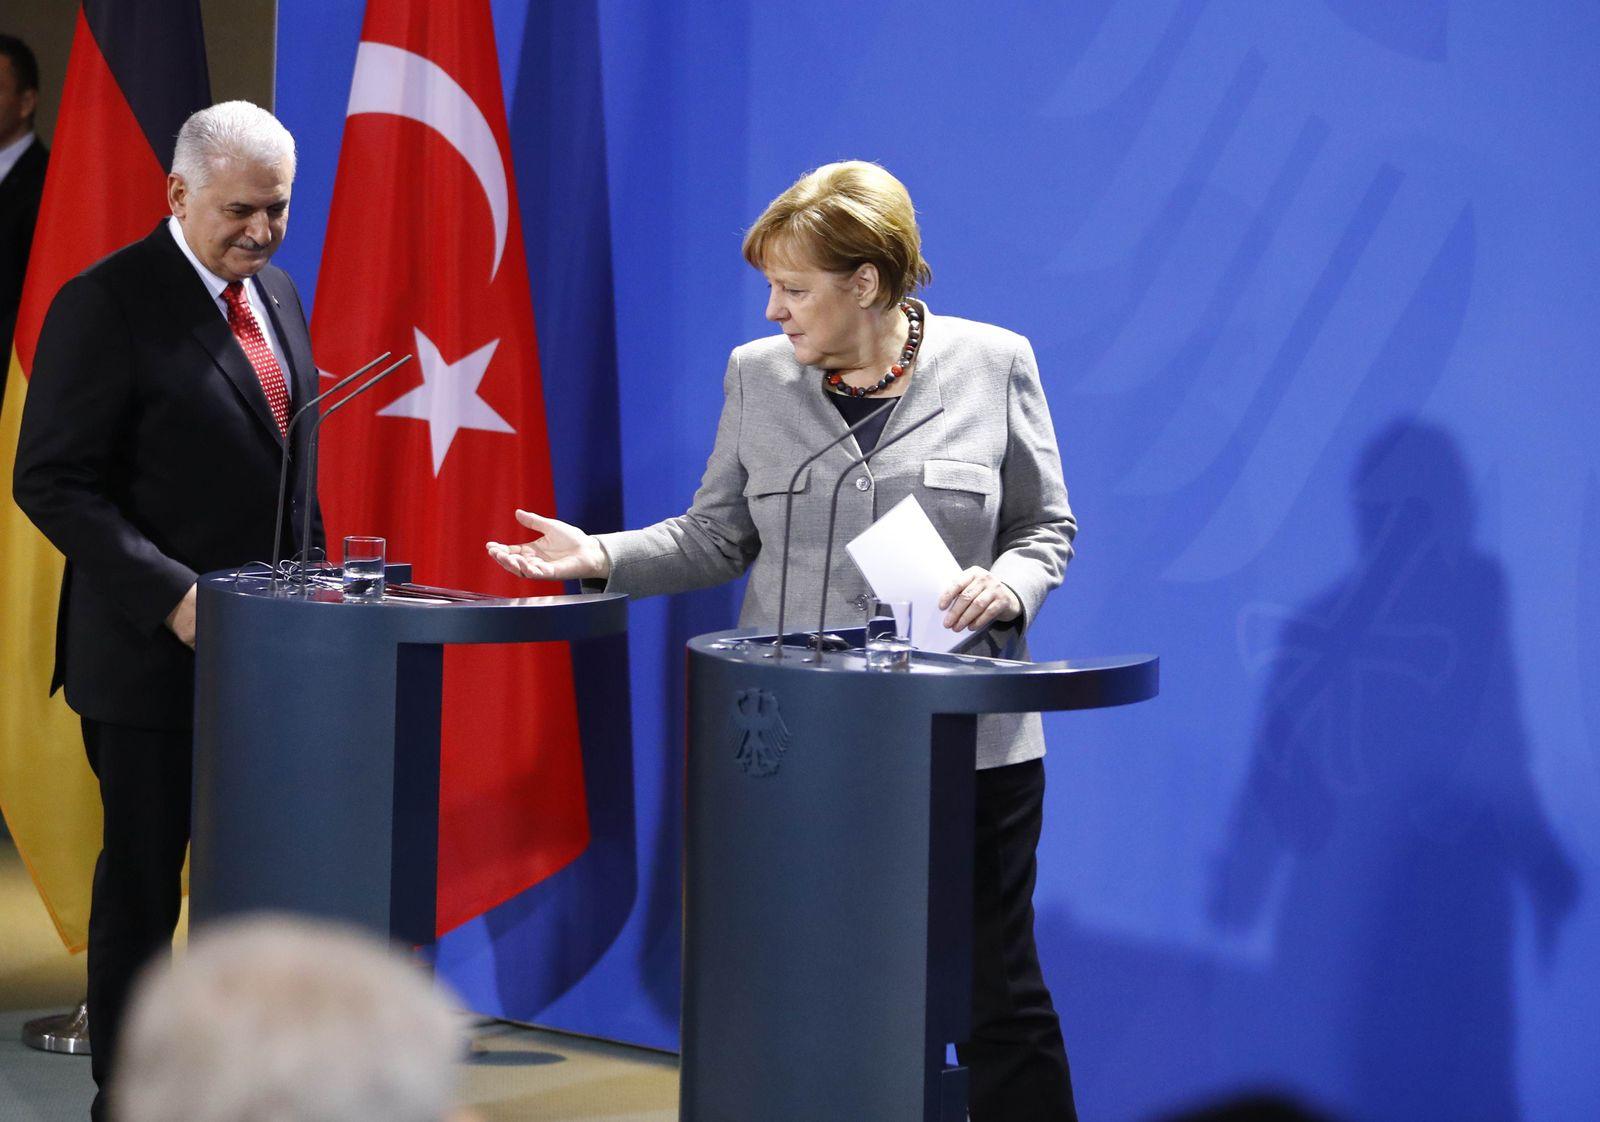 Yildirim/ Merkel